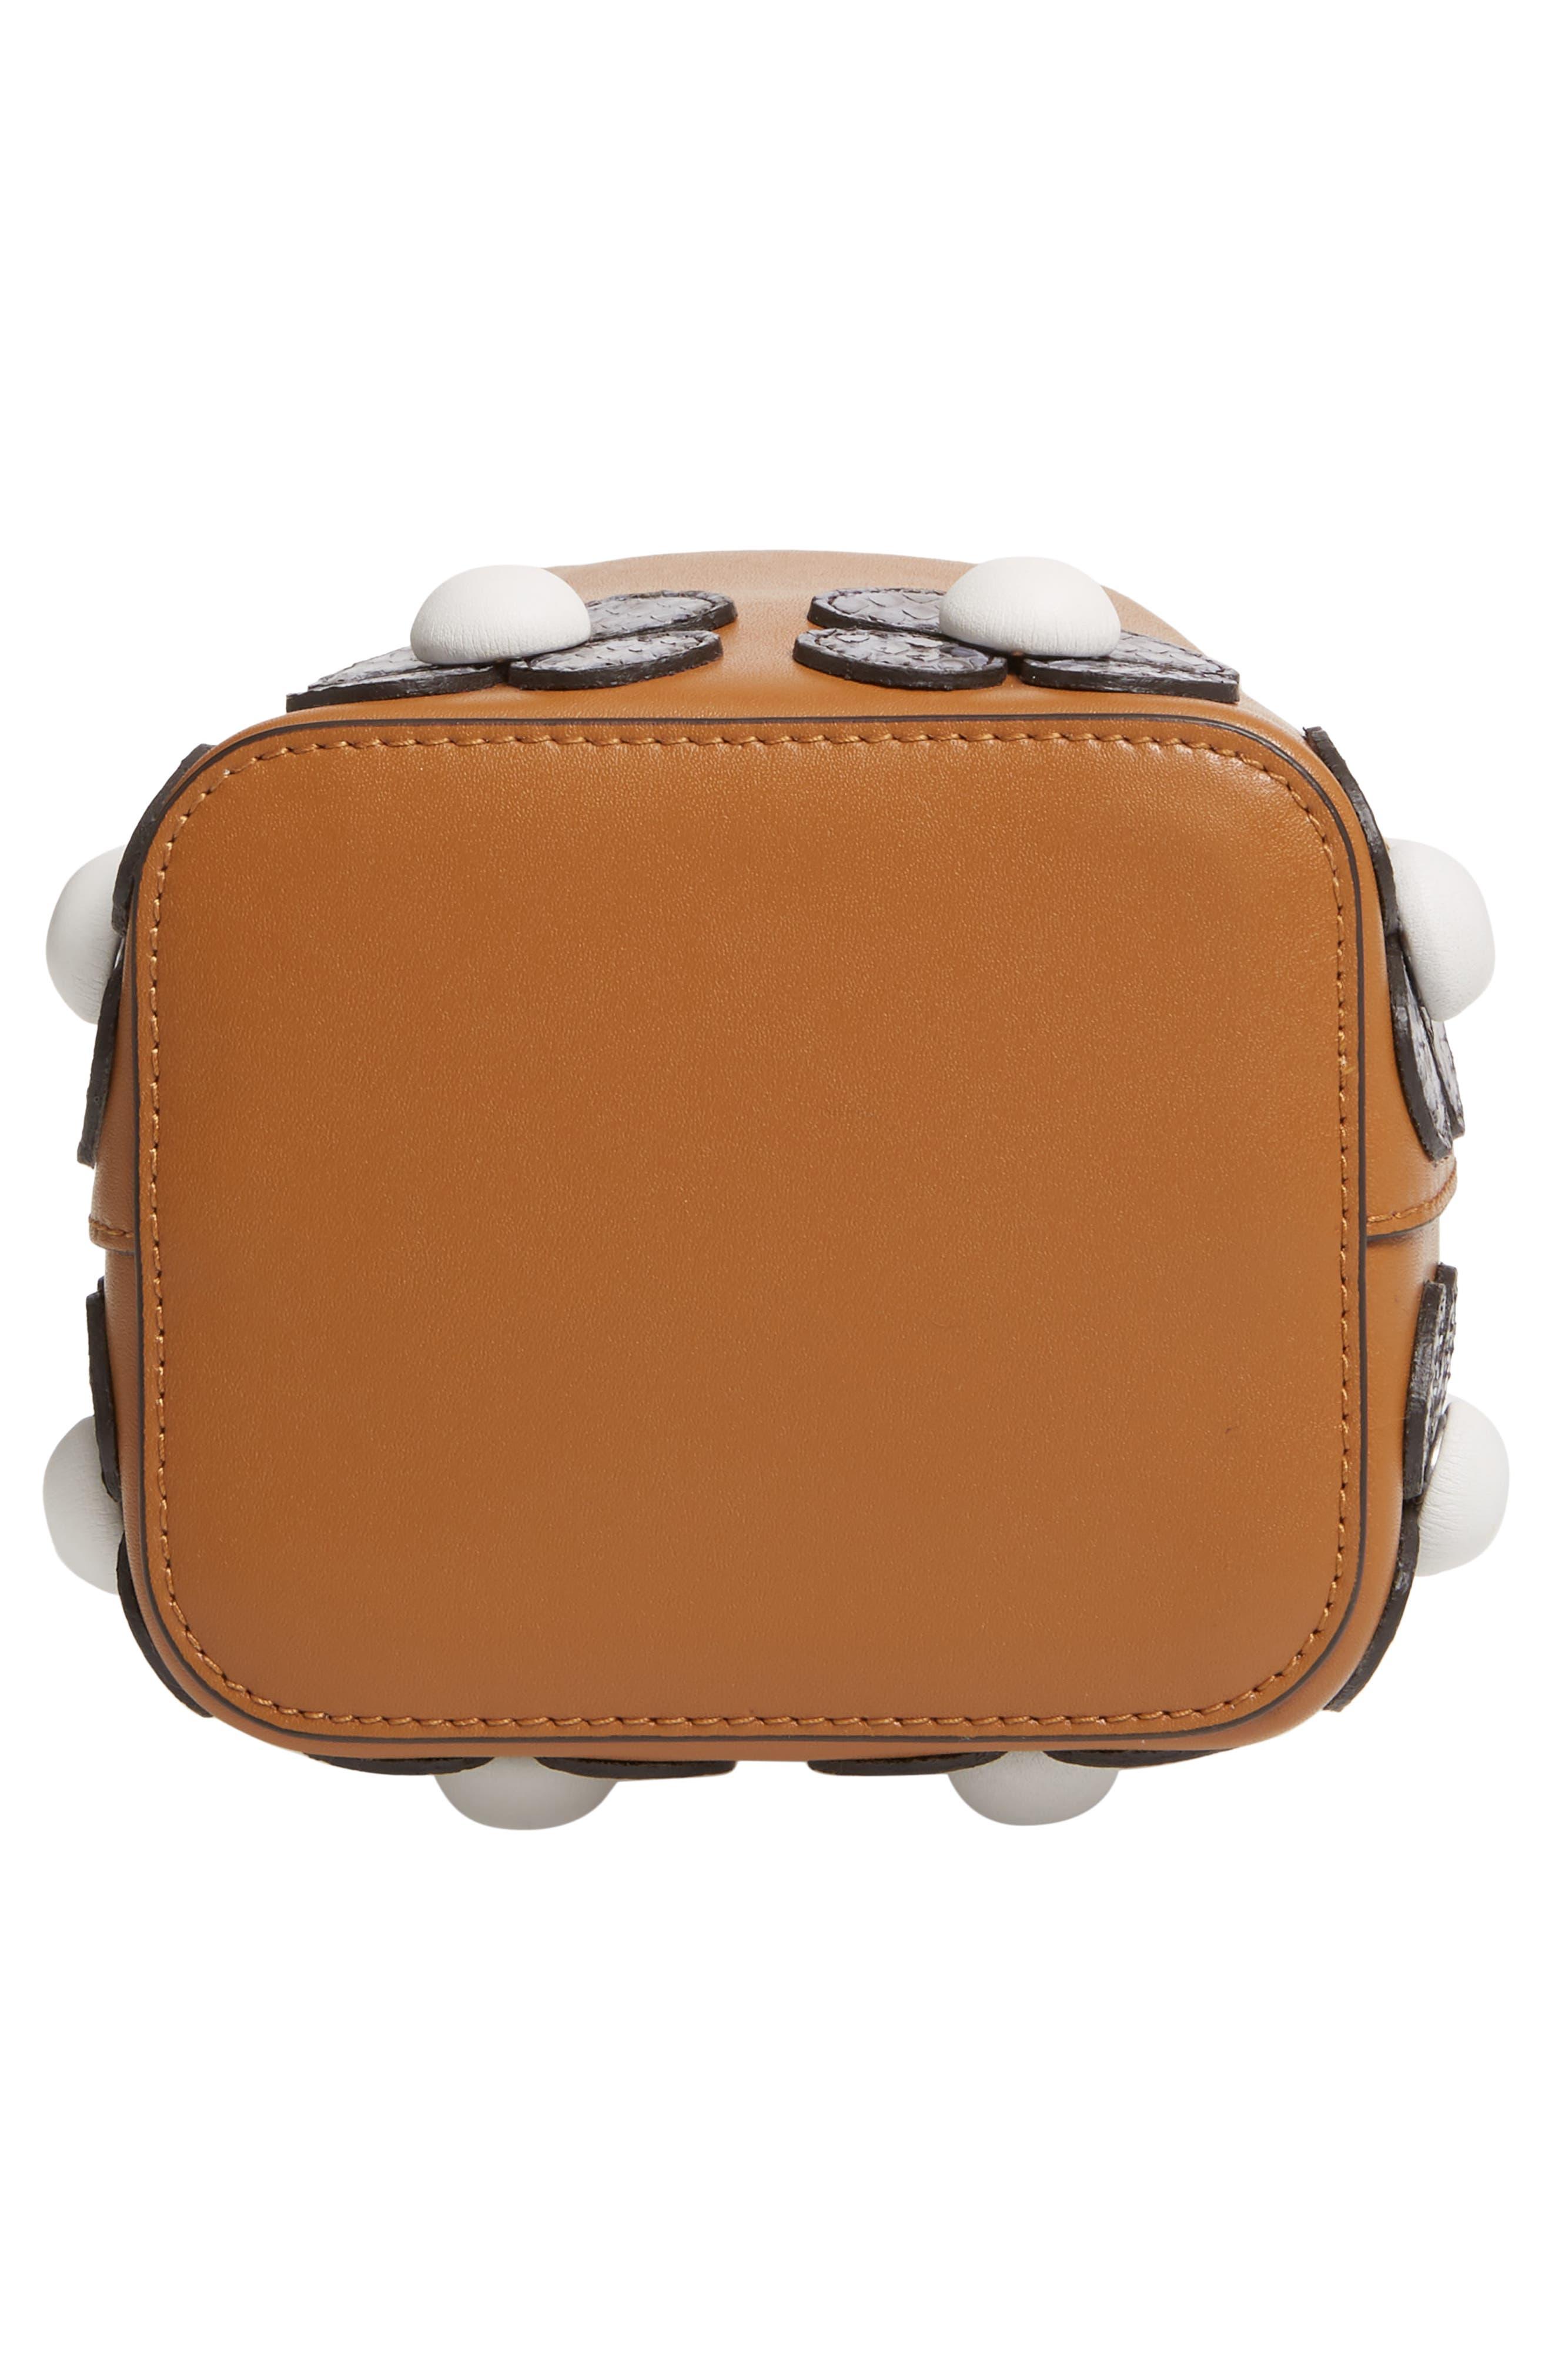 Mon Tresor Embellished Leather Bucket Bag,                             Alternate thumbnail 7, color,                             CARAMEL